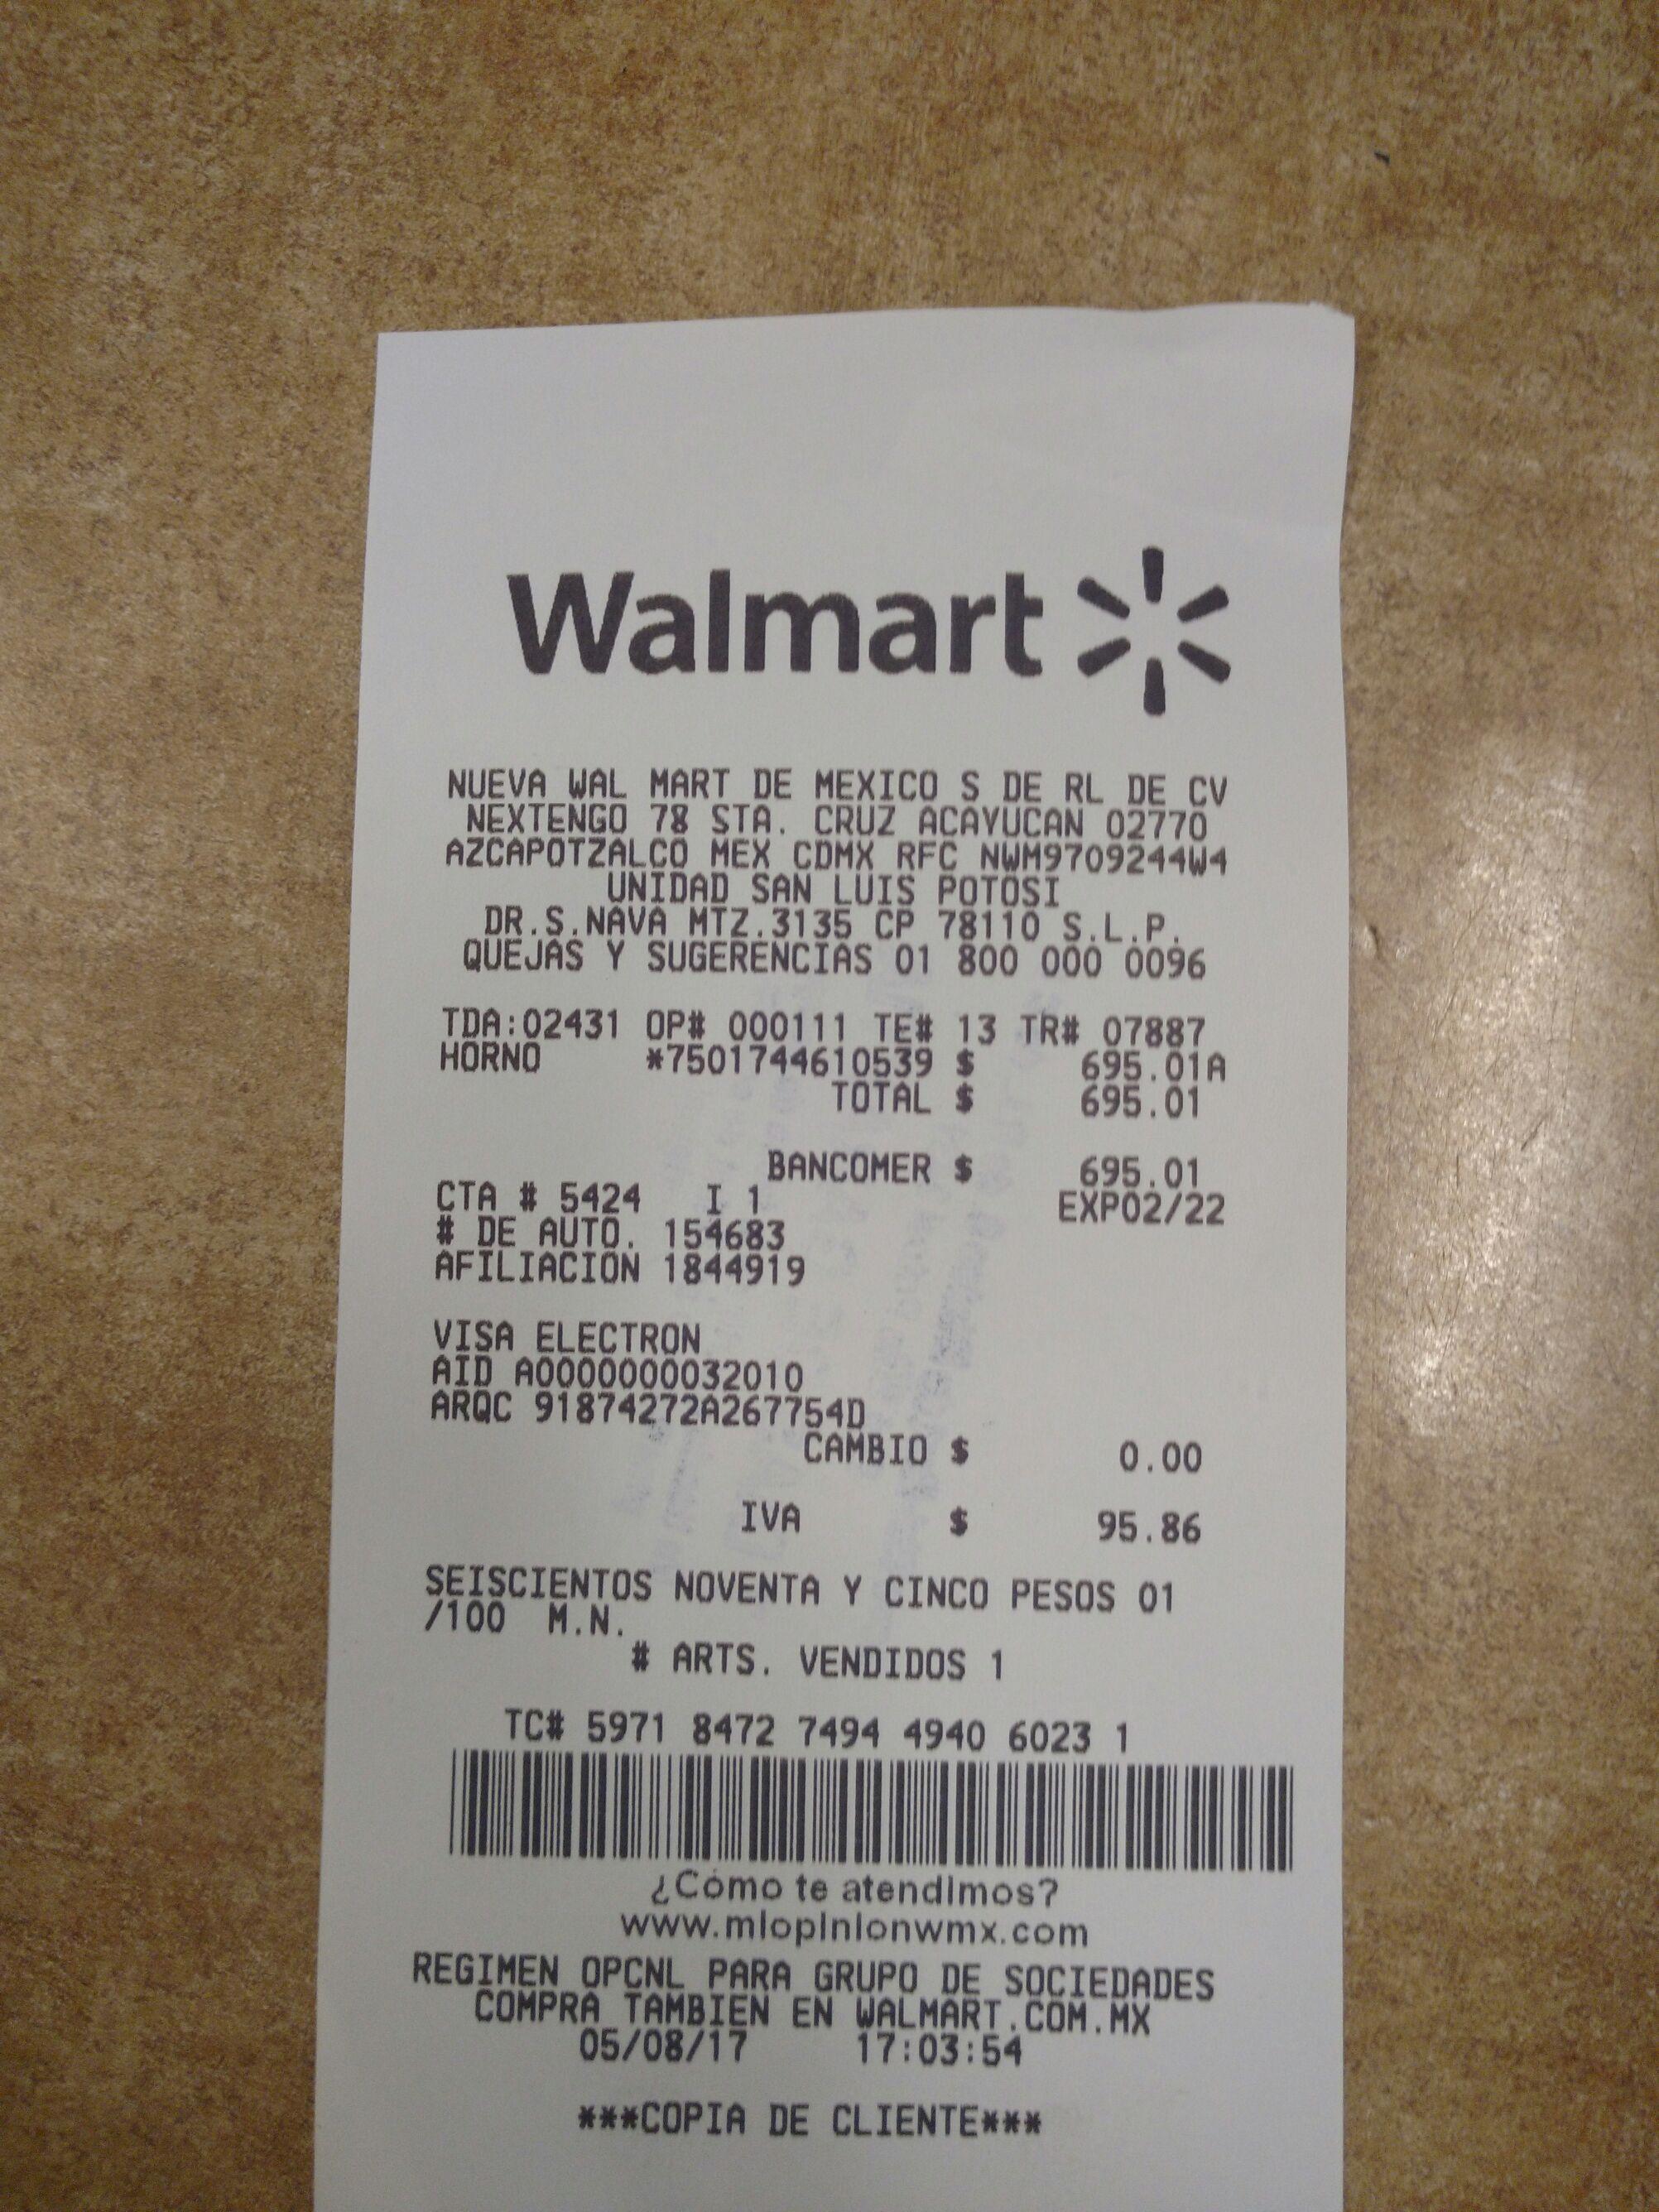 Walmart: Horno de Microondas Daewoo 1.1 pies a $695.01